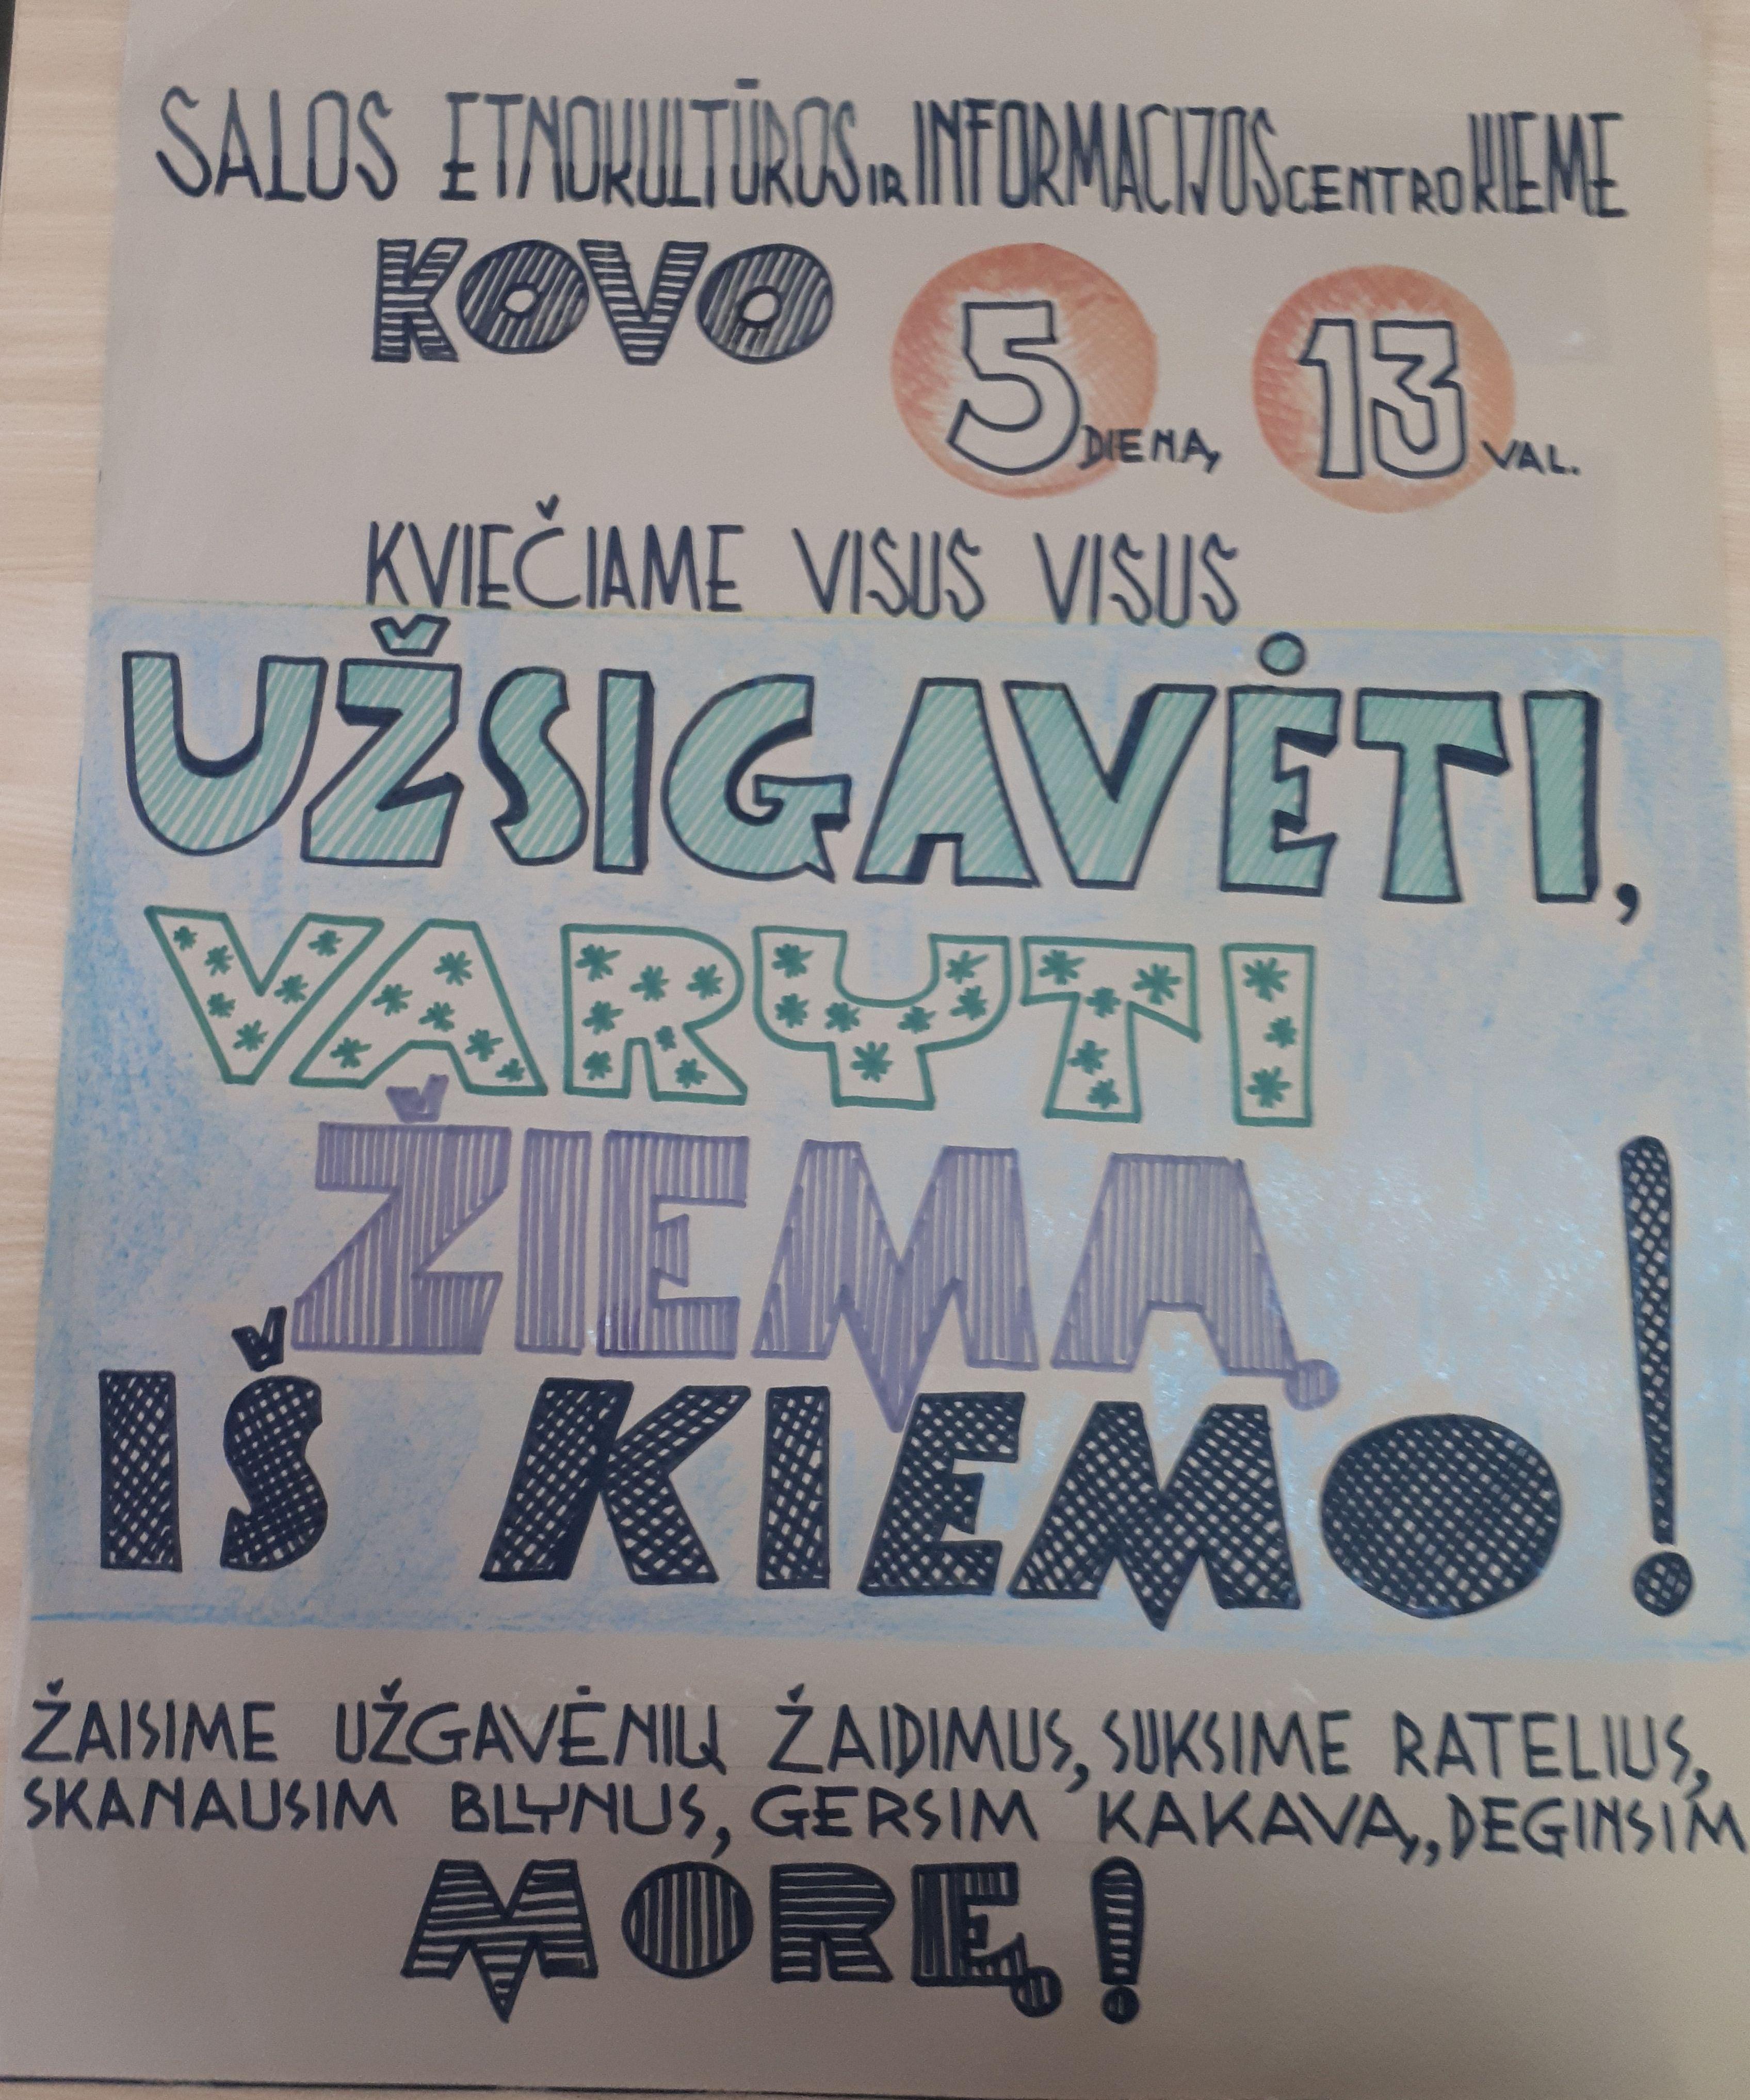 RUSNES UZGAVENES